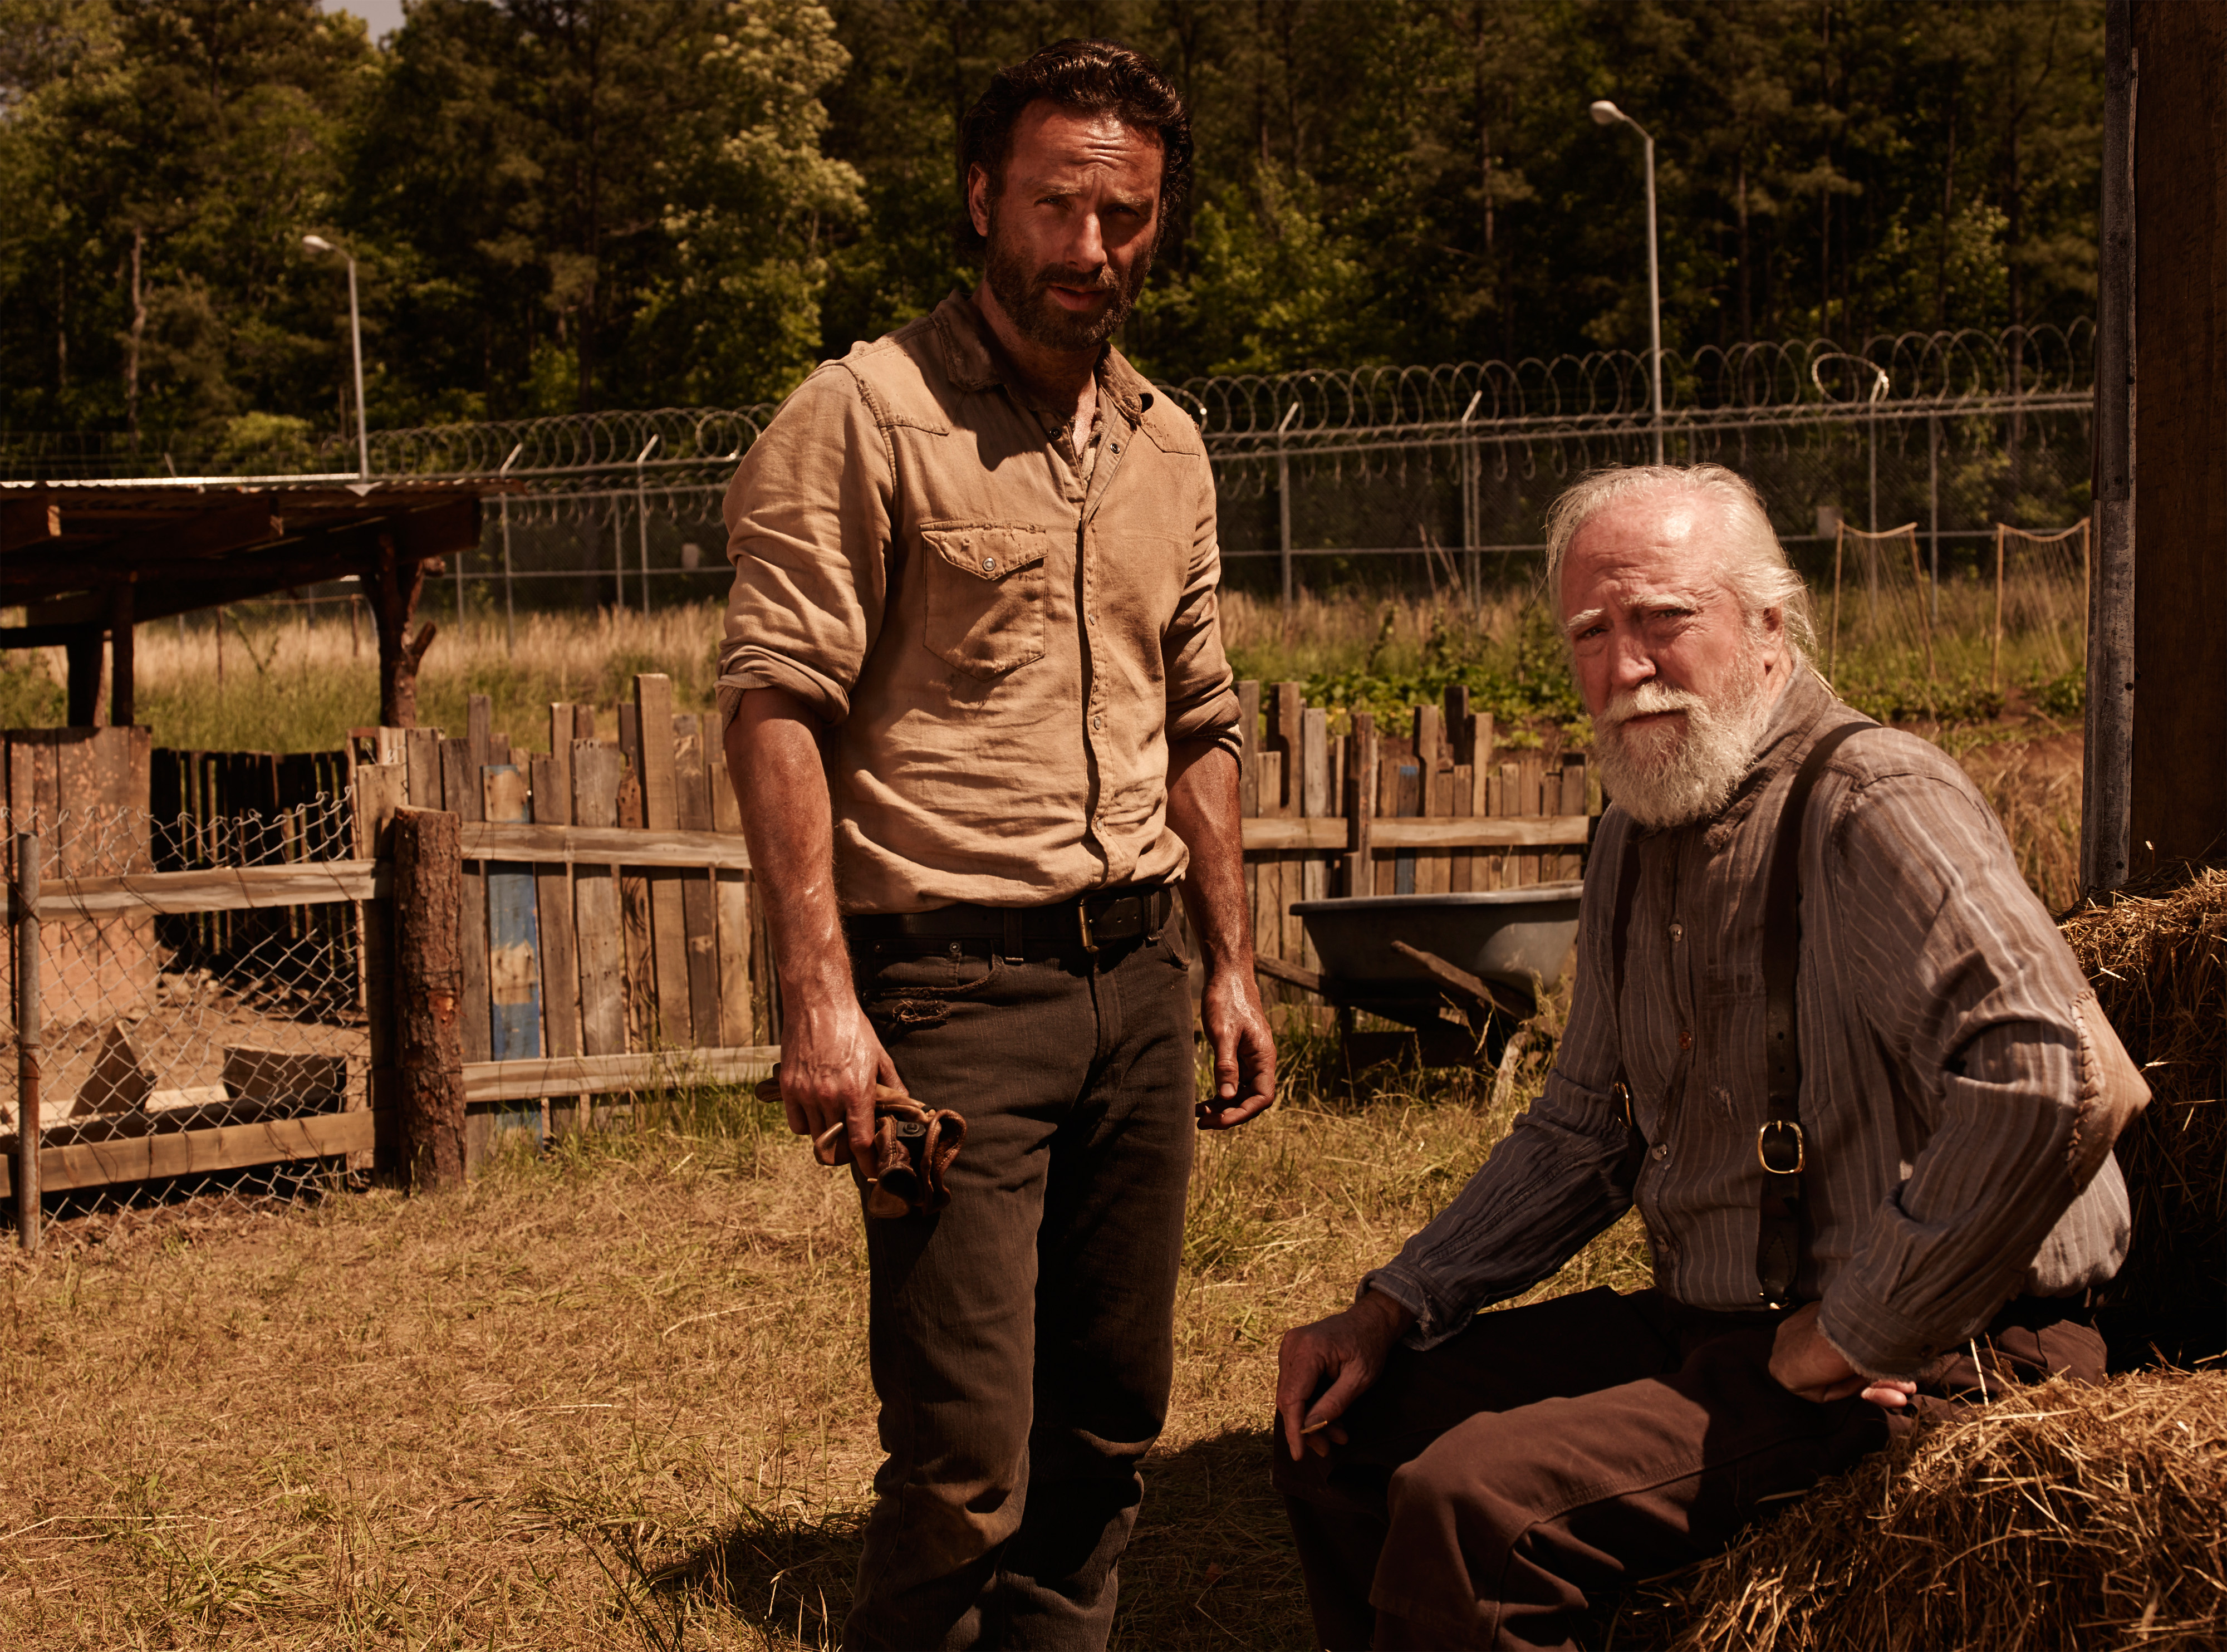 Rick-Hershel-The-Walking-Dead-4-Temporada